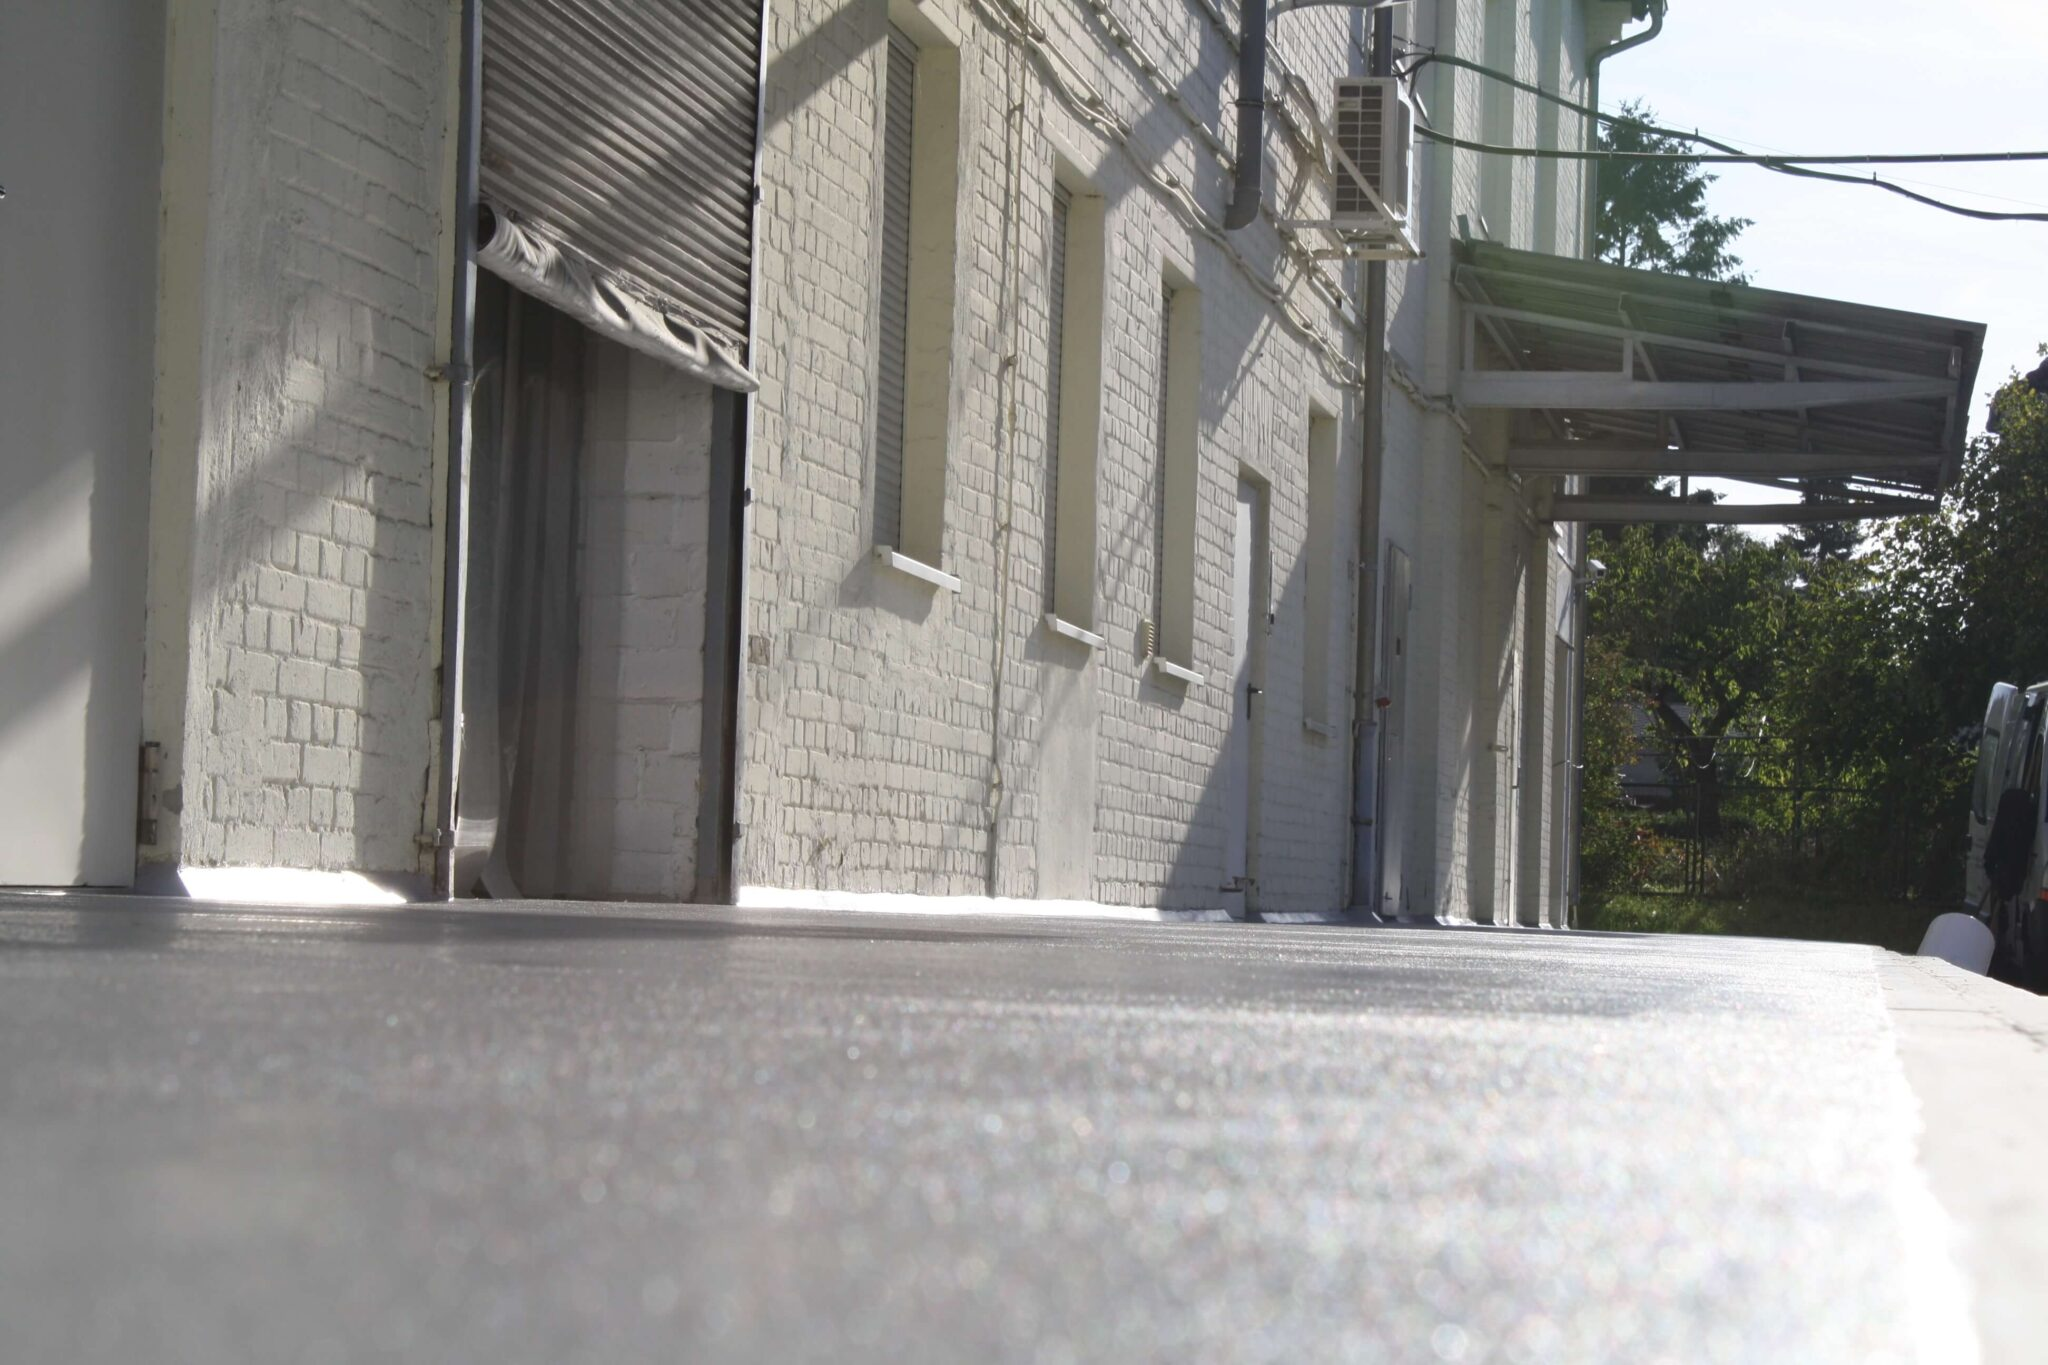 Vloer Voor Balkon : Balkon gallerijvloer designbetonvloer